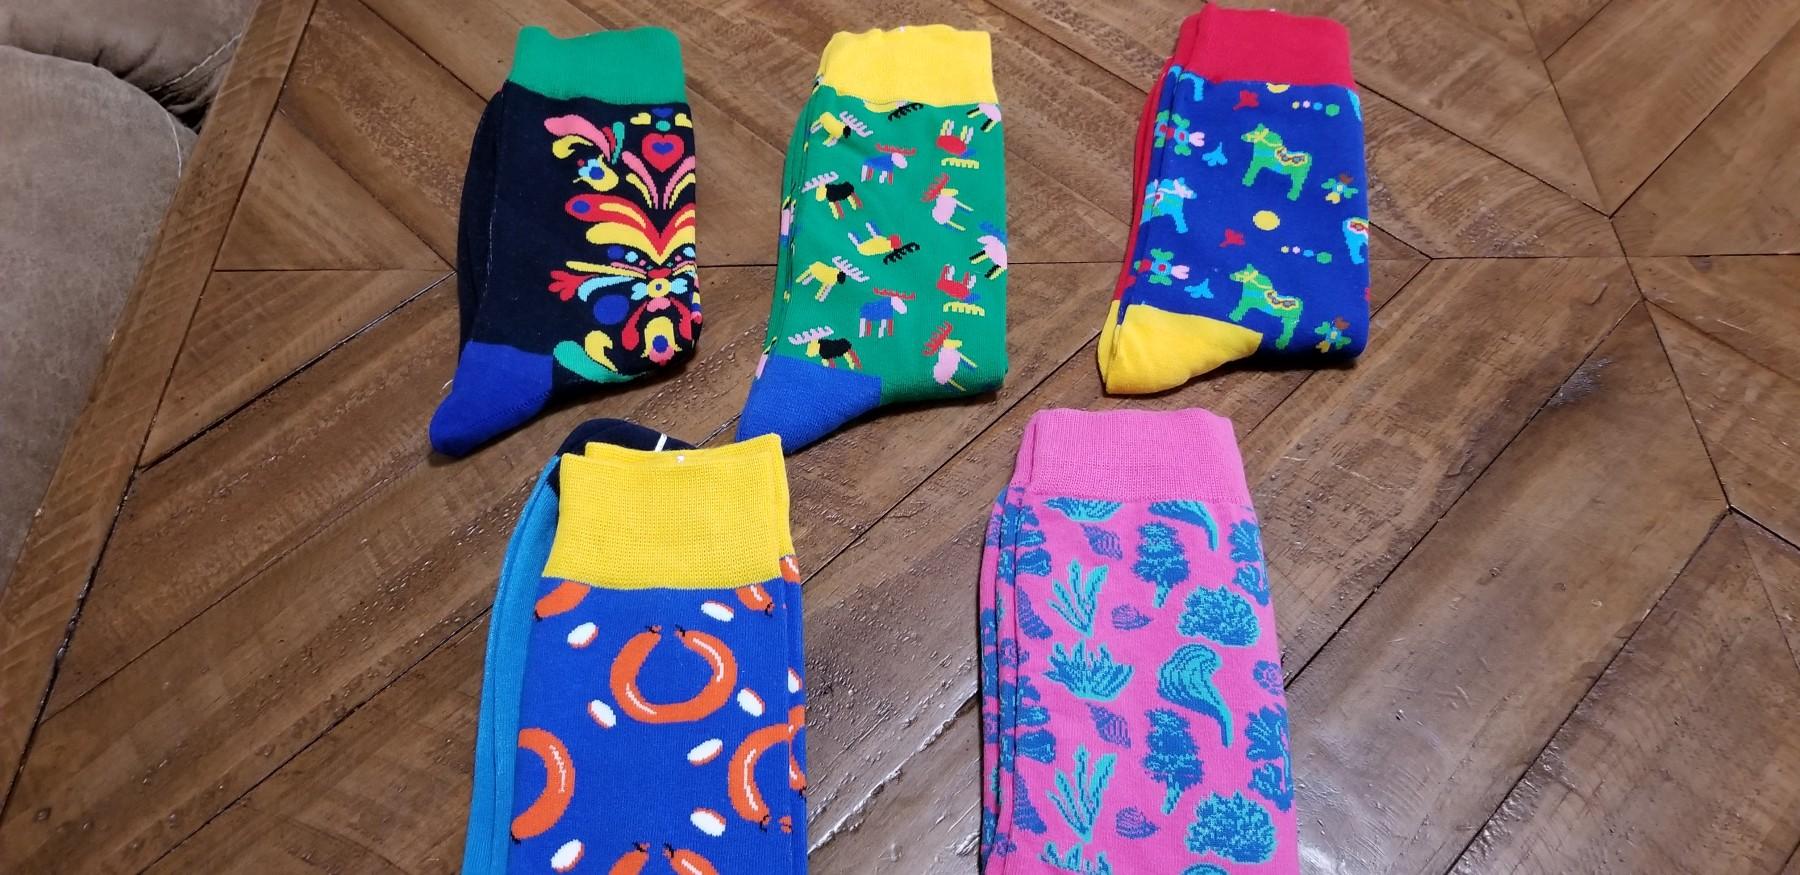 LOVE these socks!